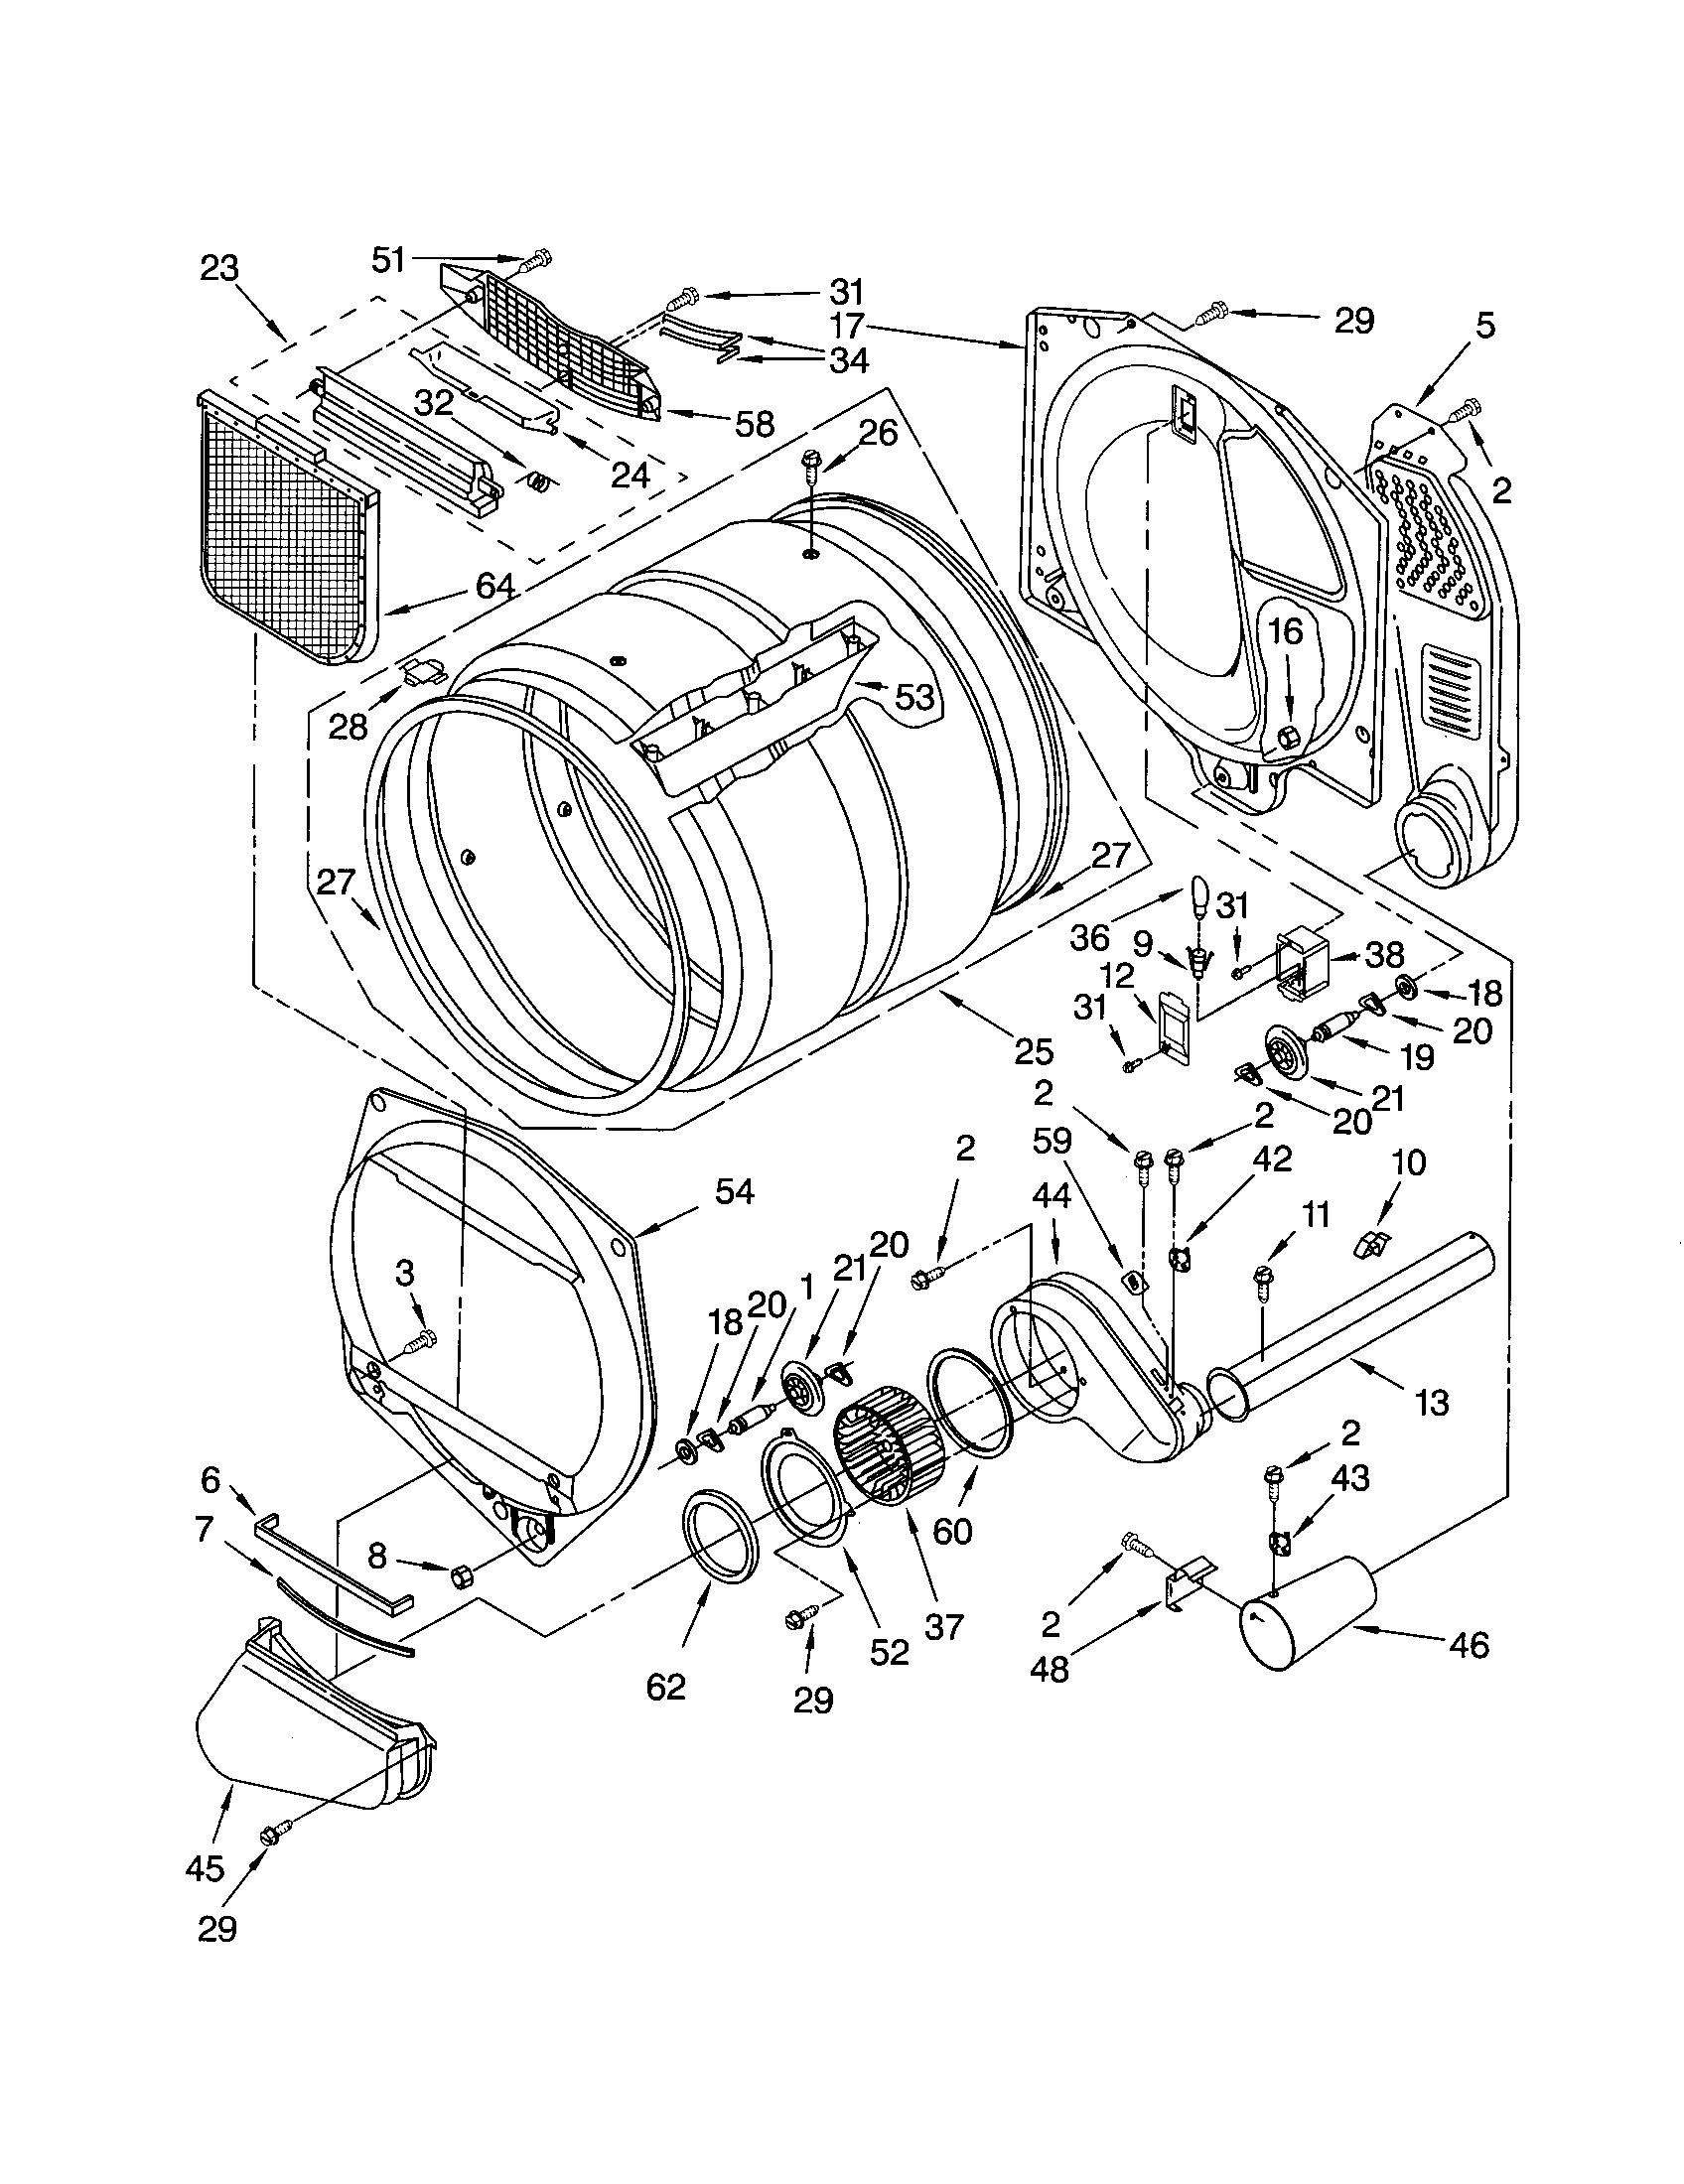 Kenmore 110.73046100 Dryer Thermal Cut-Off Fuse Kit